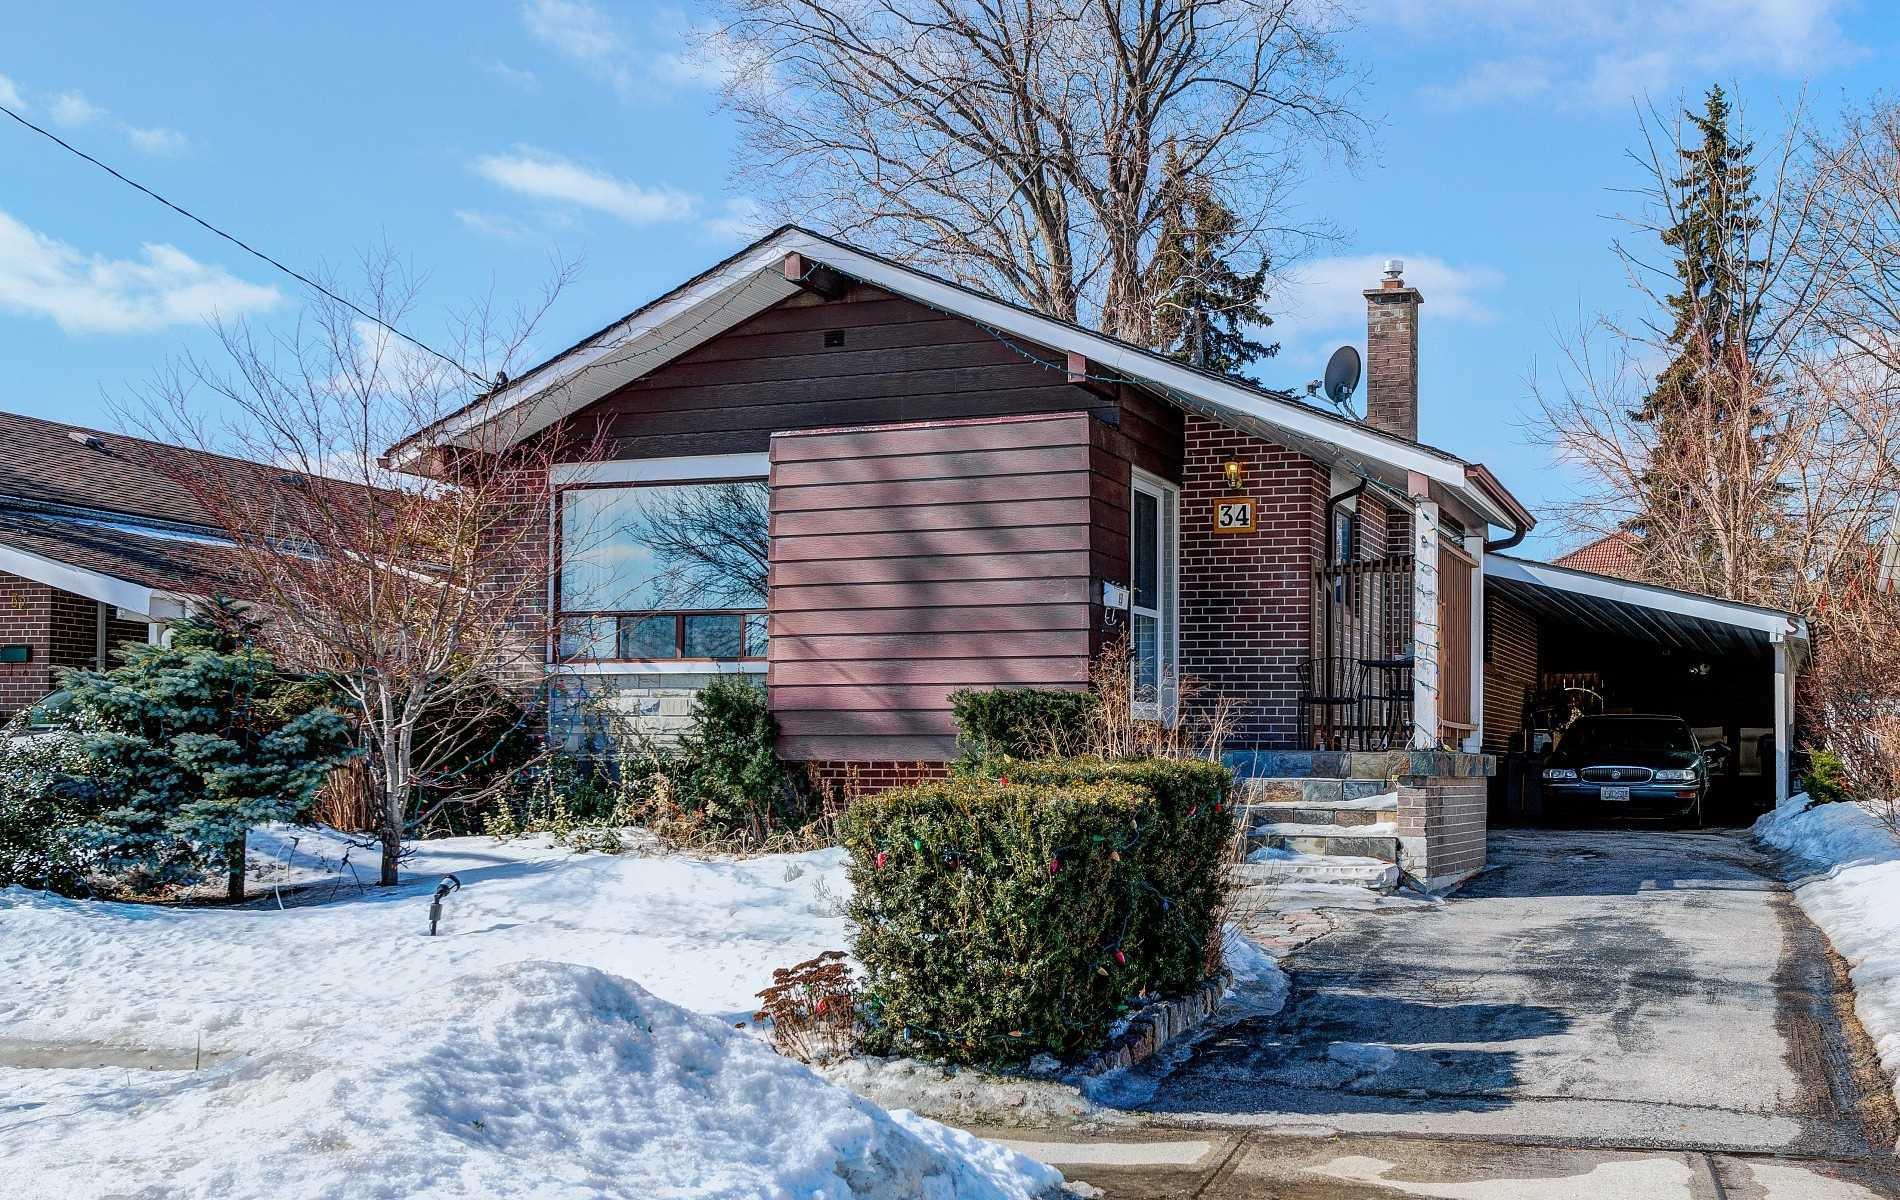 Main Photo: 34 Rowallan Drive in Toronto: West Hill House (Bungalow) for sale (Toronto E10)  : MLS®# E4382523